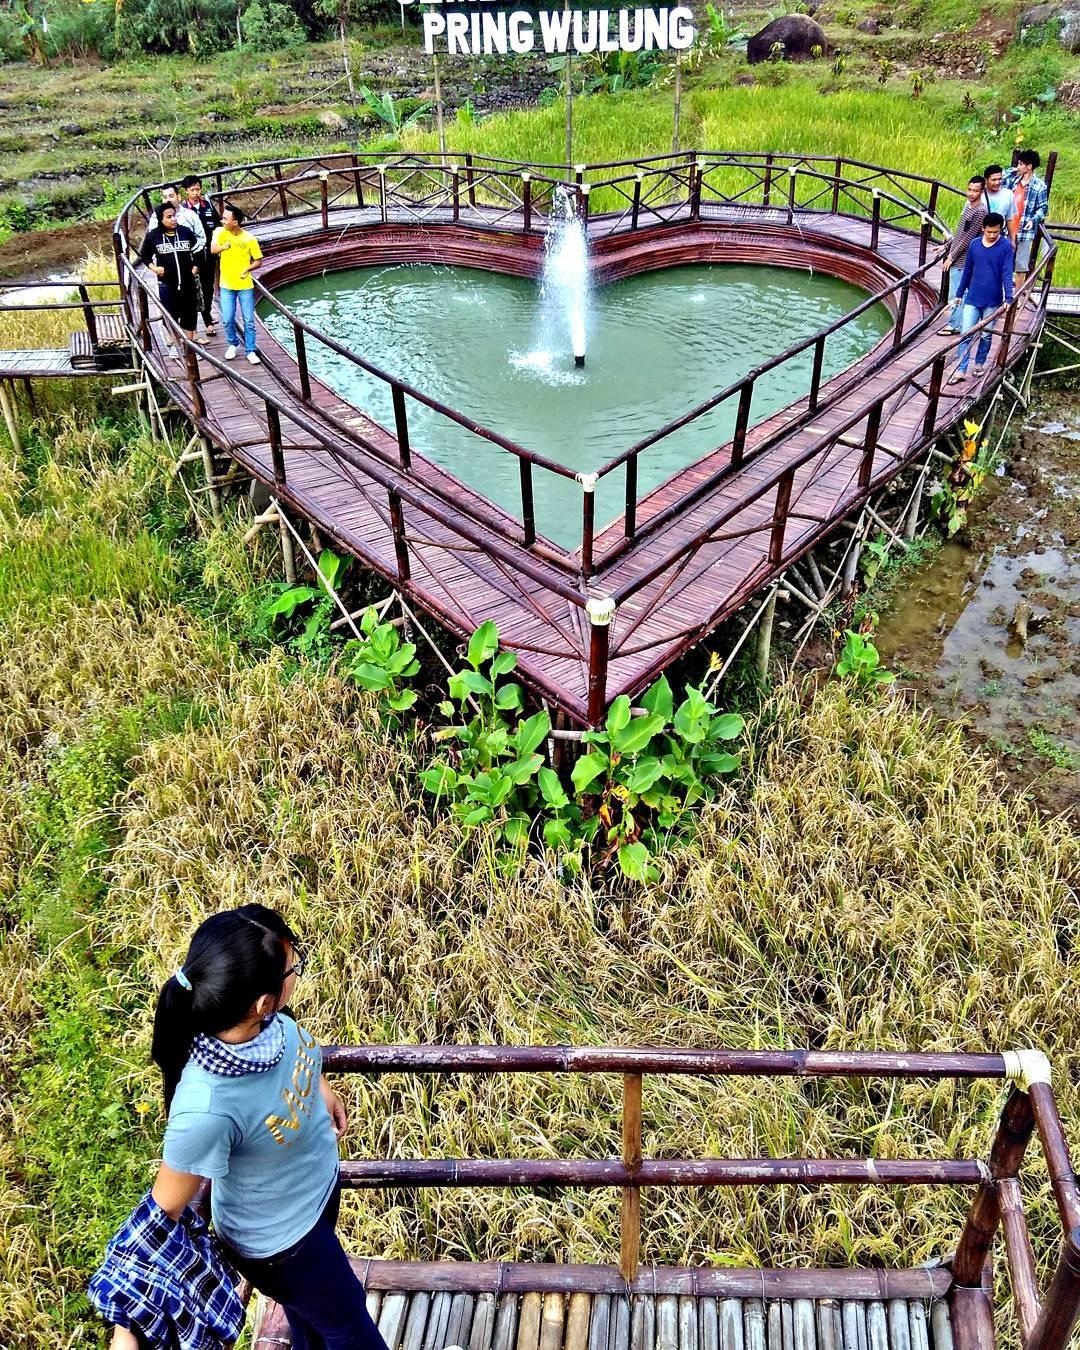 Wisata Jembatan Cinta Pring Wulung Bakpia Mutiara Jogja Kab Purbalingga